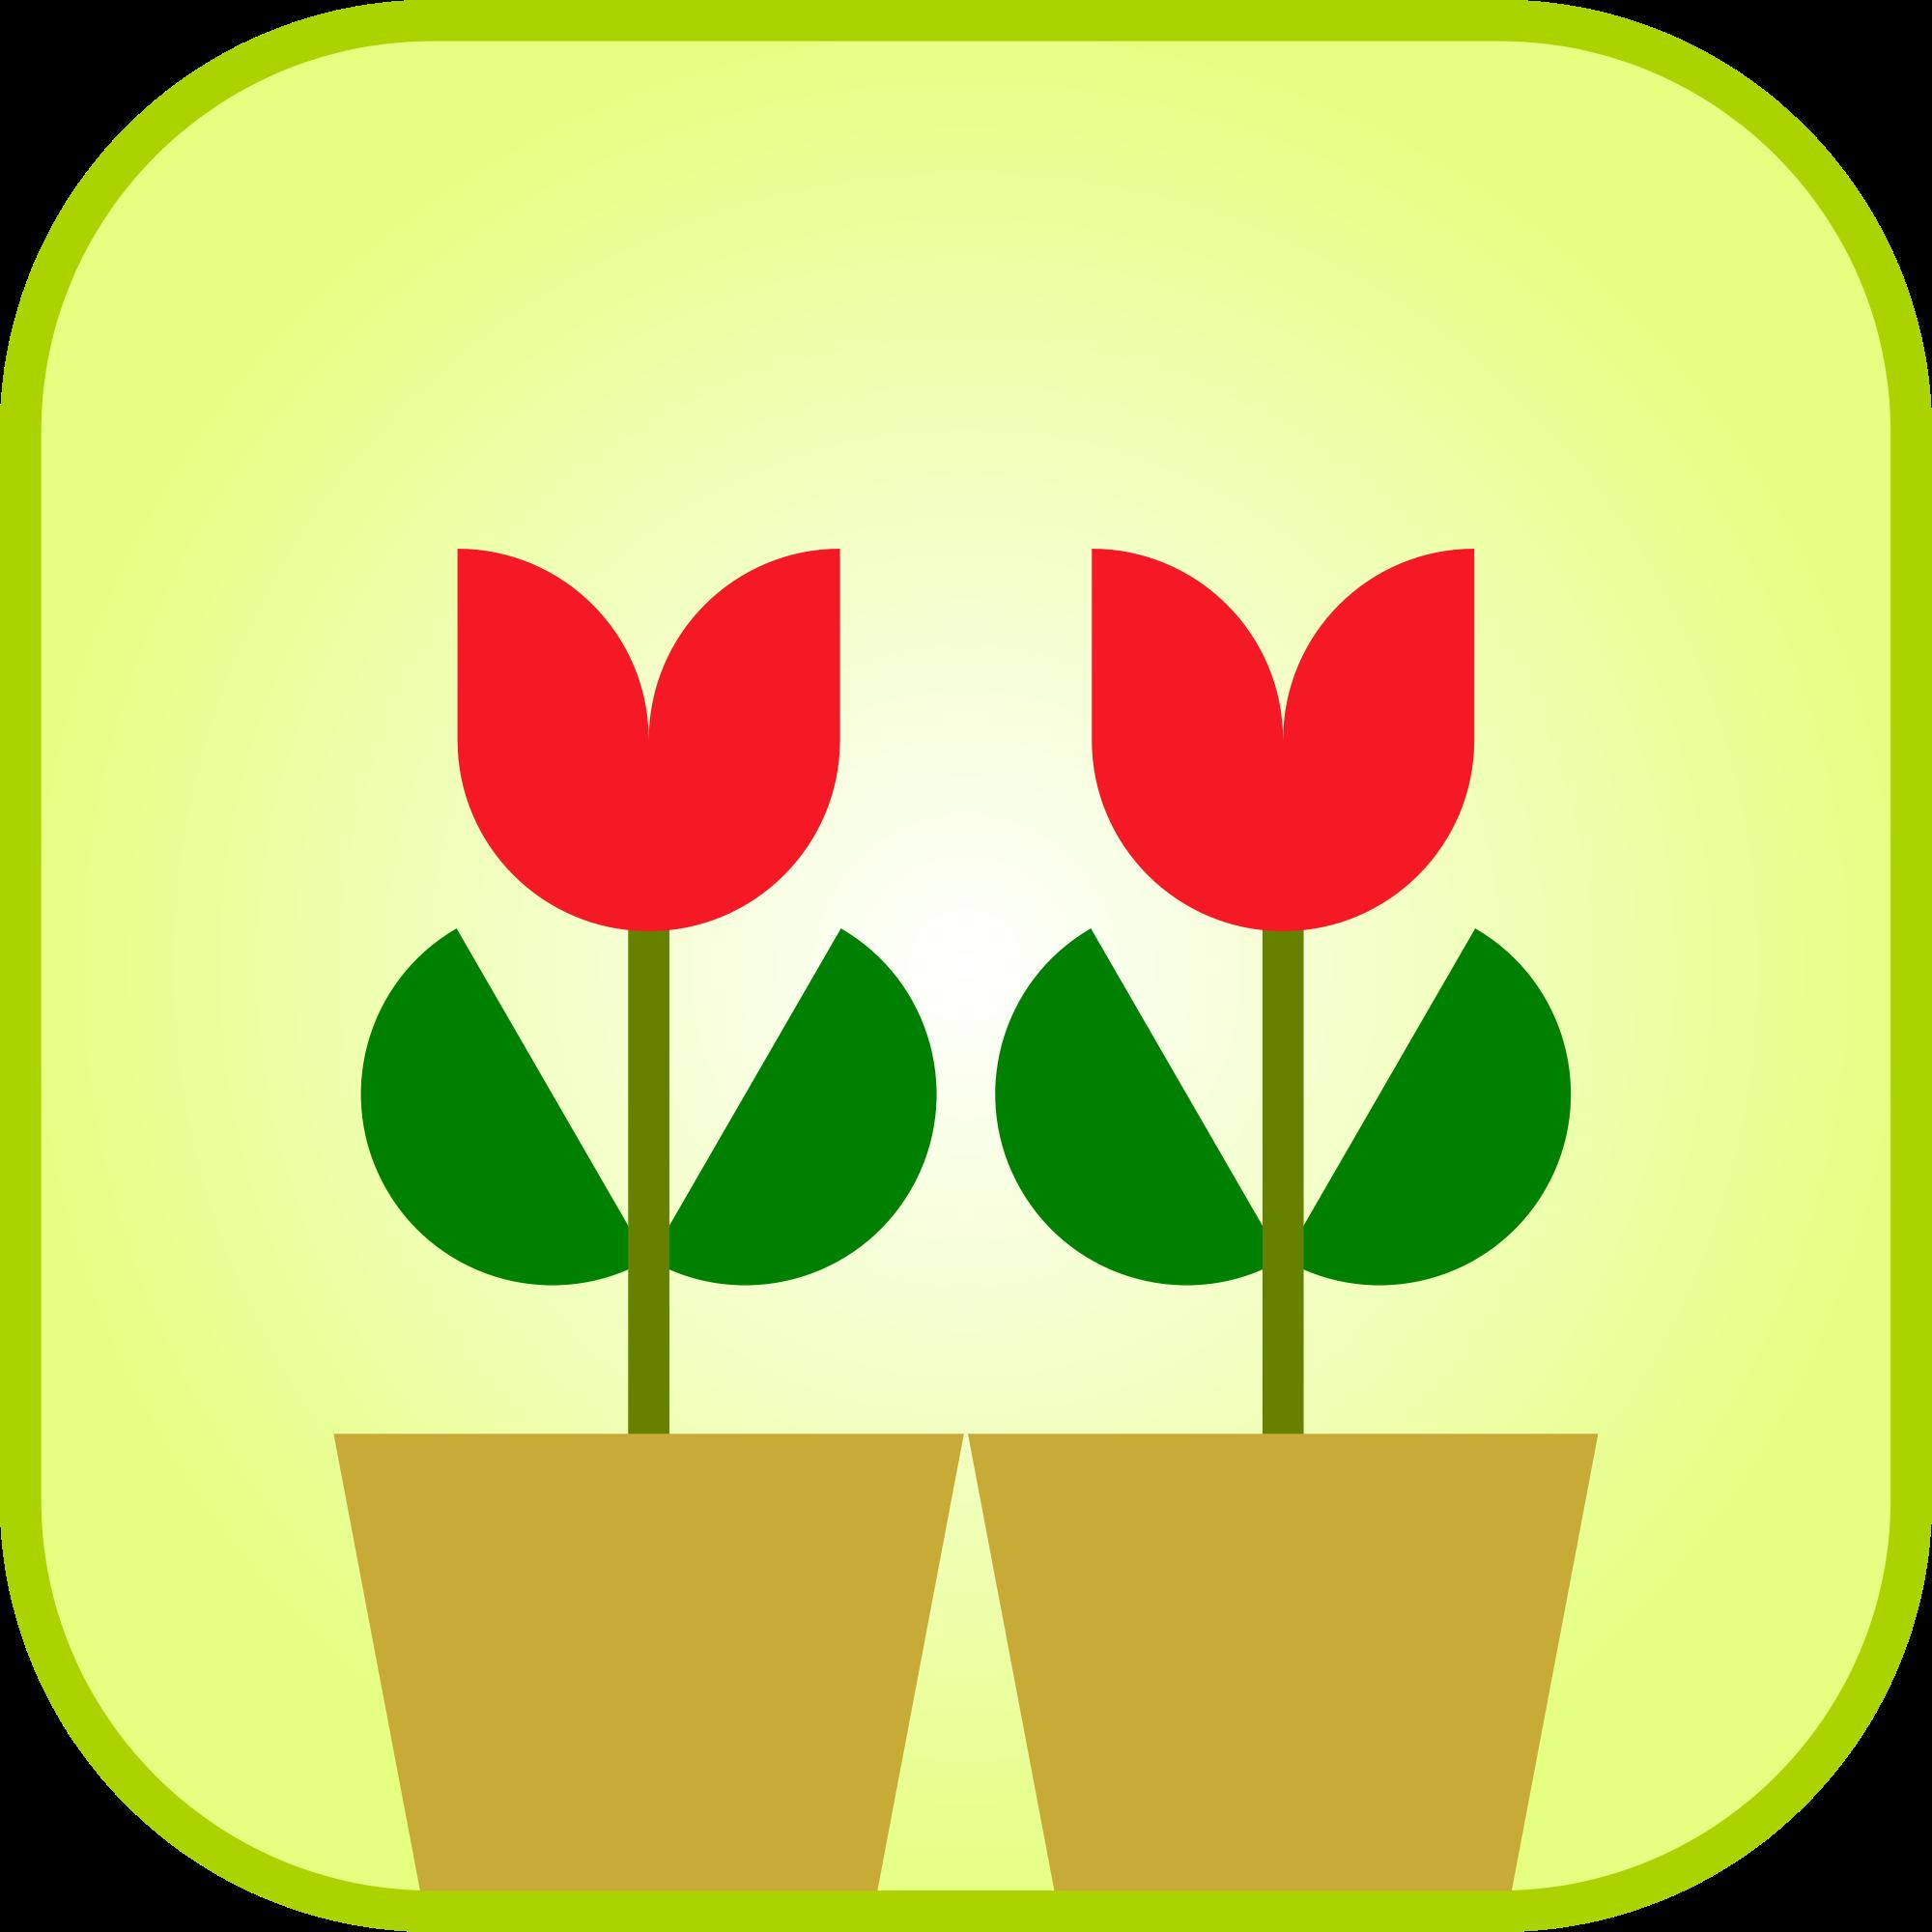 Tulip svg #6, Download drawings